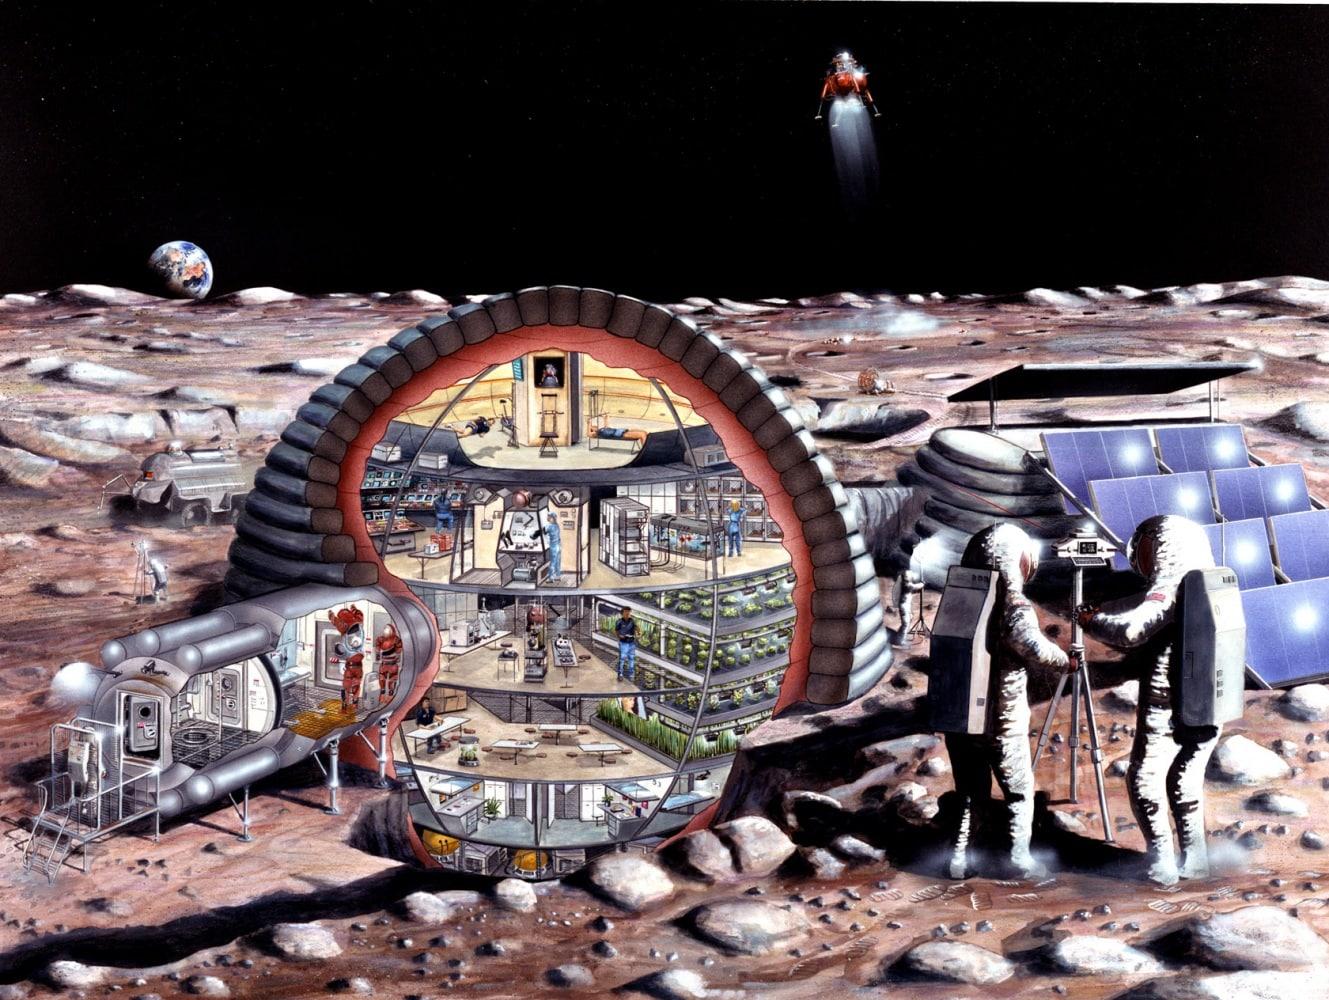 Ufologia e dintorni - Pagina 2 _inflatable_habitat_s89_20084.1500x1000